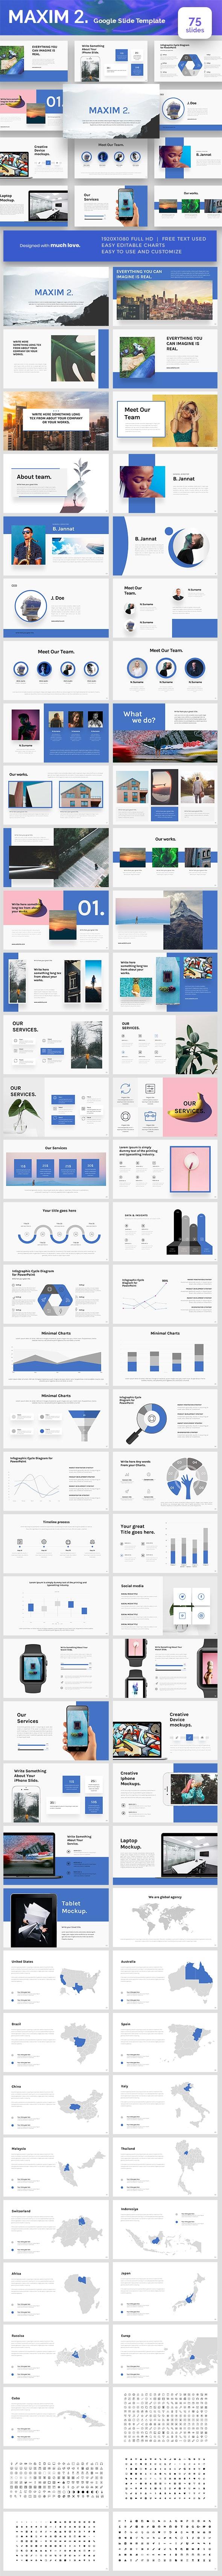 Maxim 2 Google Slides Presentation Template - Google Slides Presentation Templates